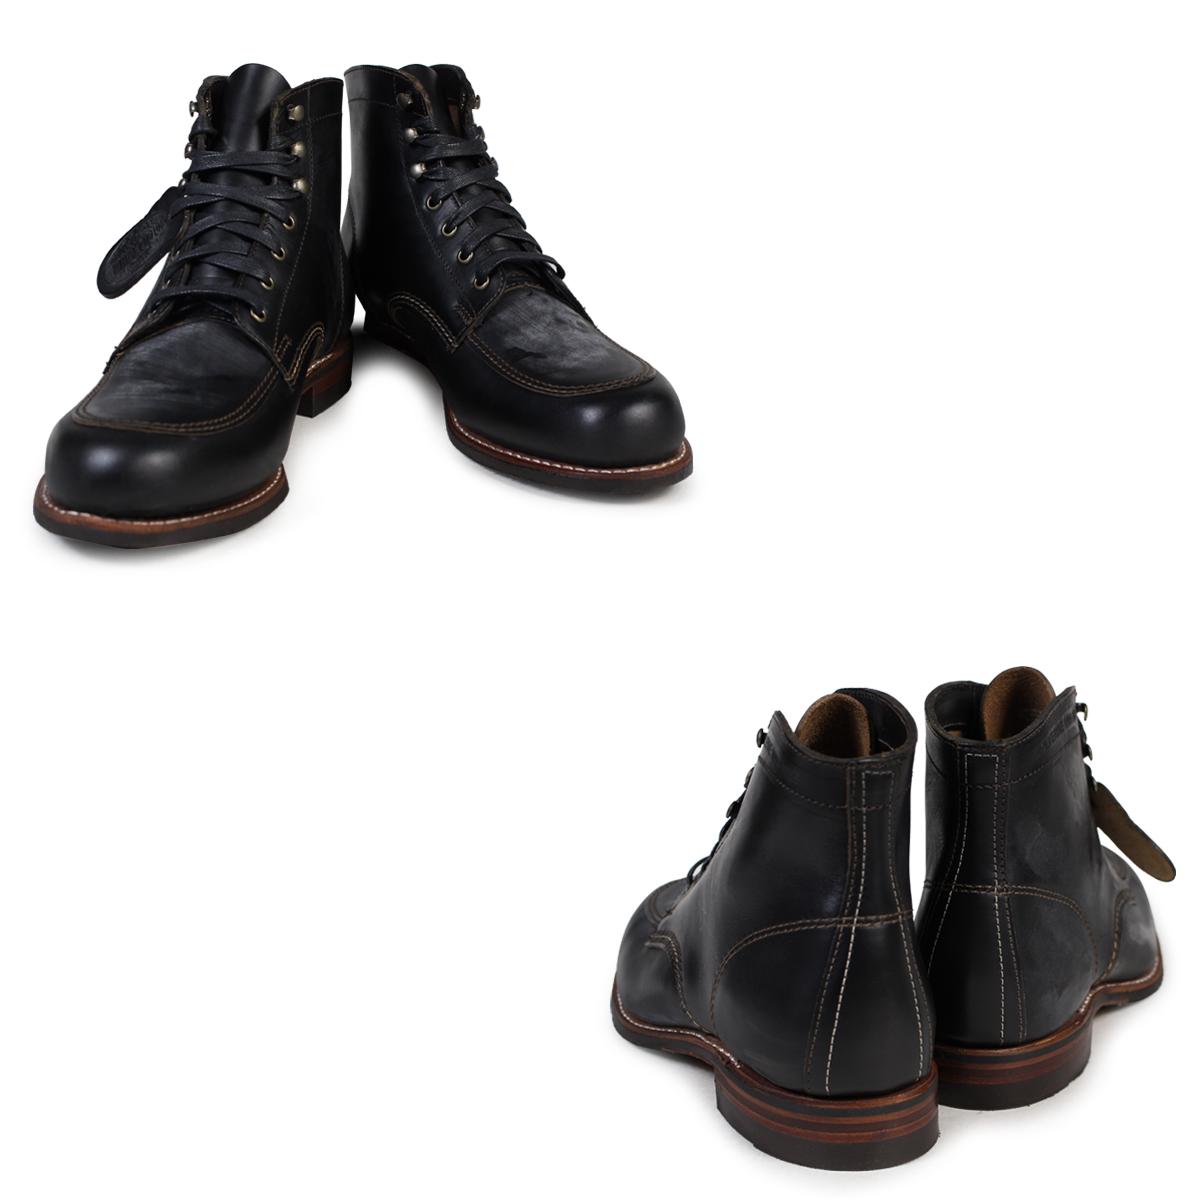 [SOLD OUT]uruvarin WOLVERINE 1000英里长筒靴COURTLAND 1000 MILE BOOT D怀斯W00279黑色嘲笑二工作长筒靴人